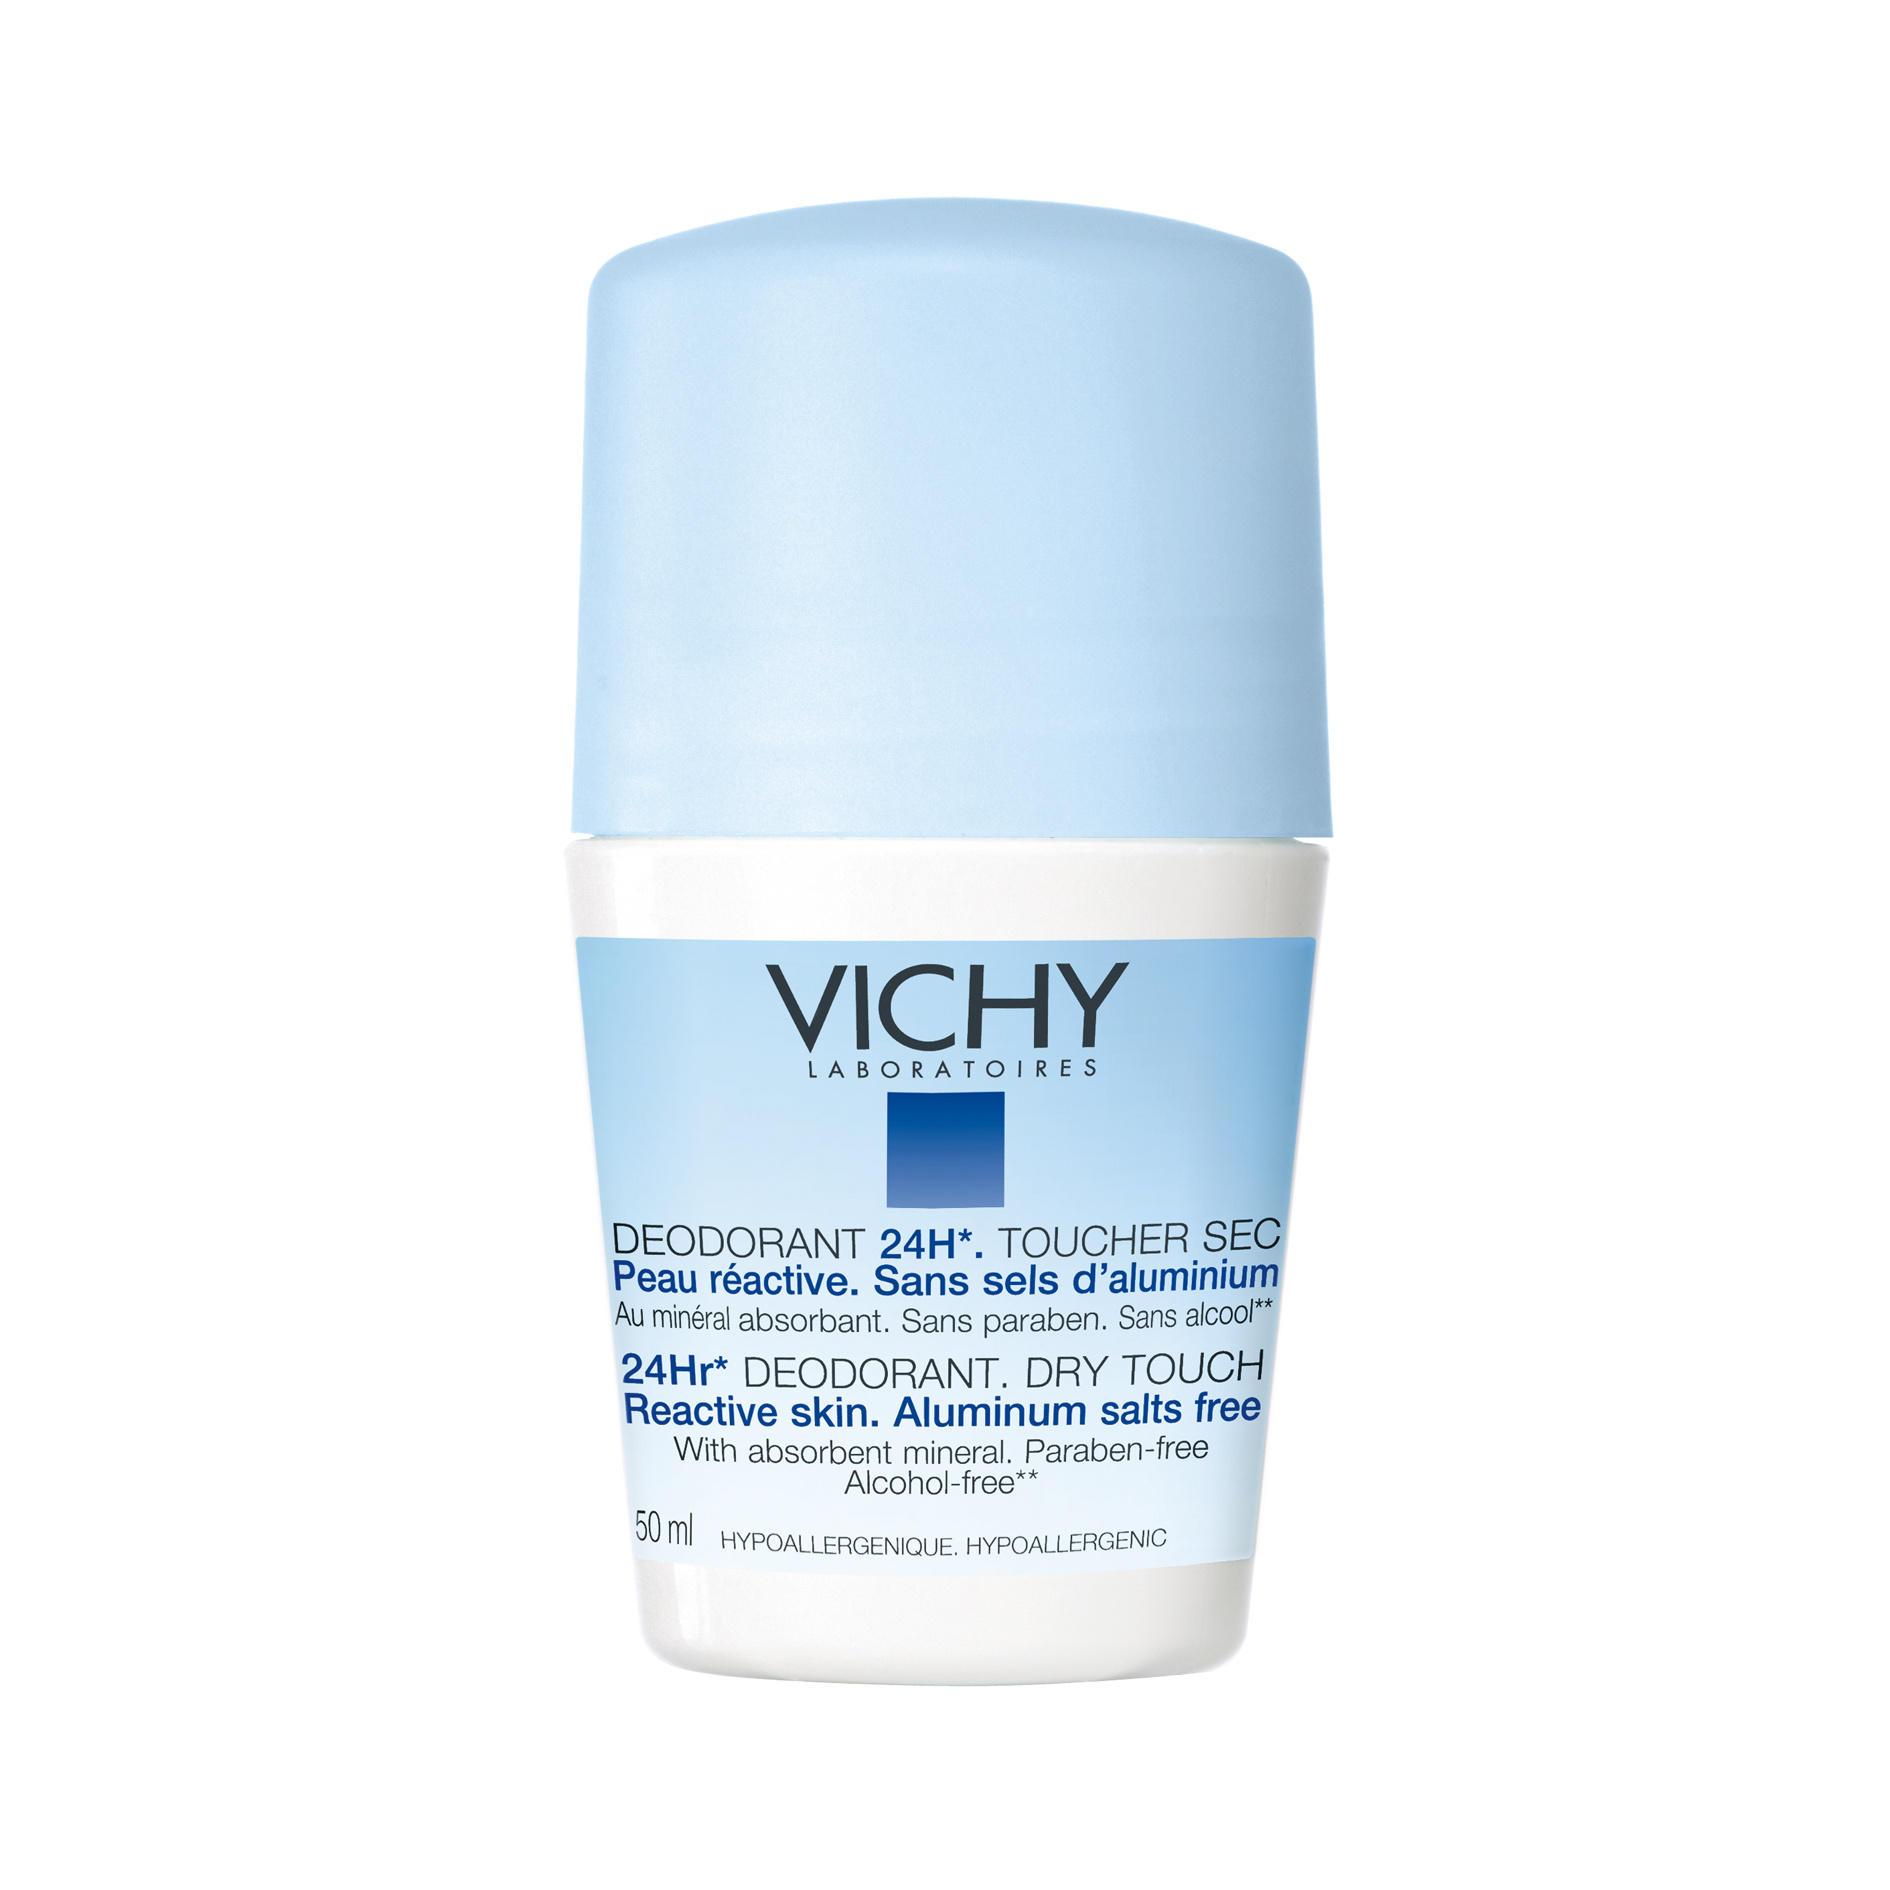 vichy deodorant 24 hour aluminium salt free roll on chemist direct. Black Bedroom Furniture Sets. Home Design Ideas